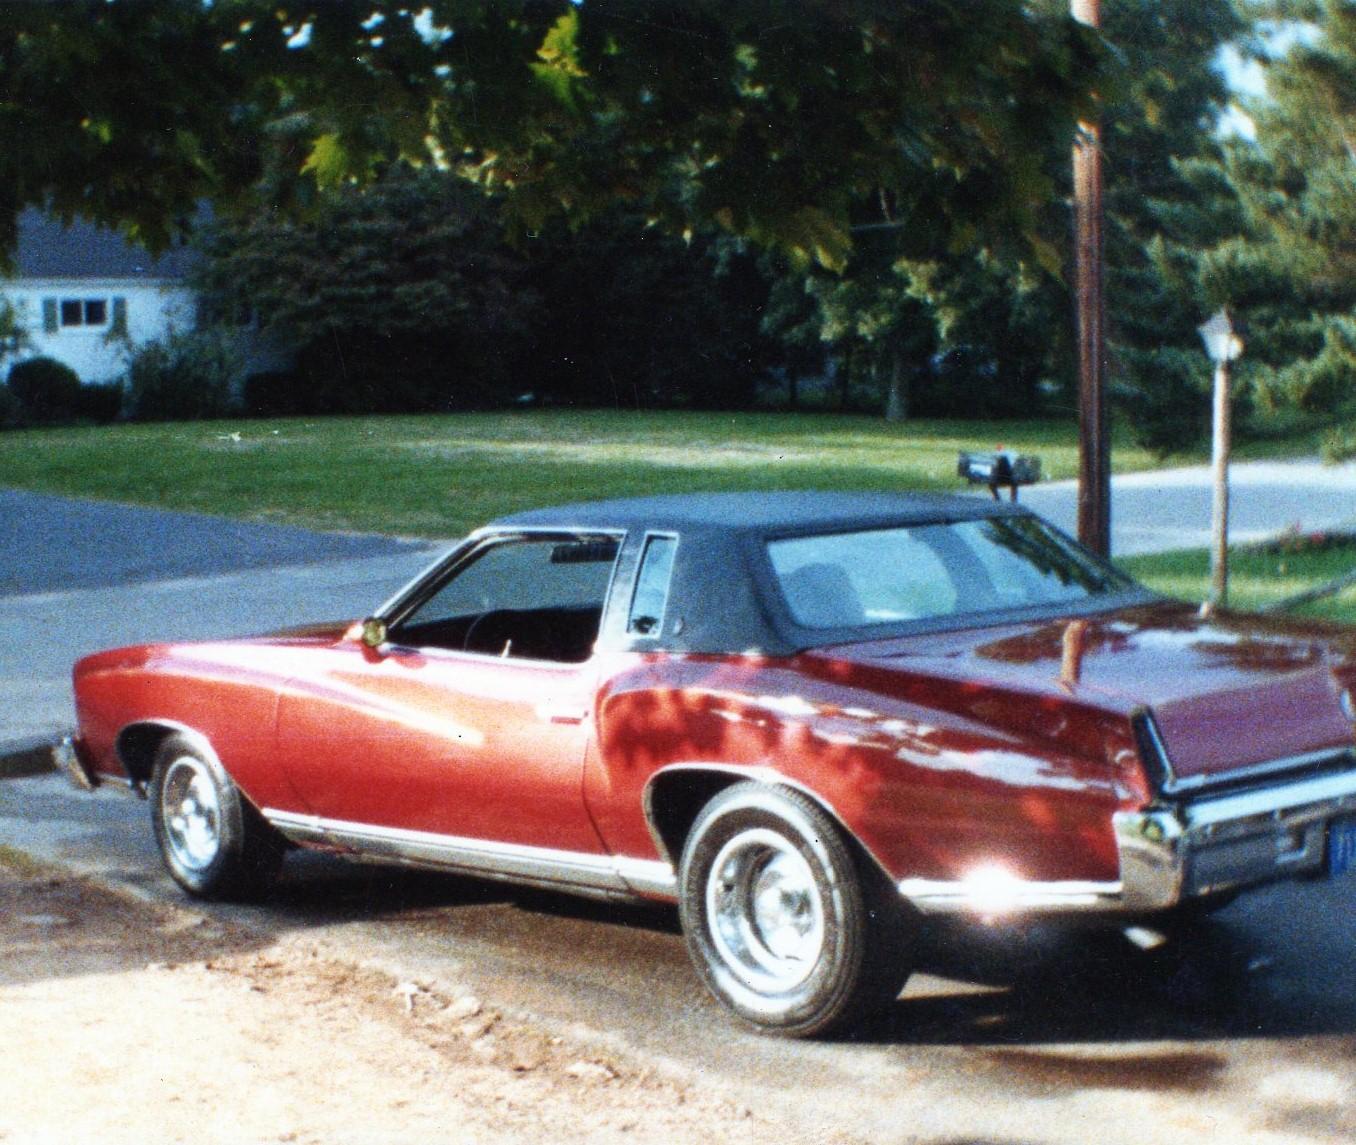 Diagram 2008 Chevy Impala 3 5 Engine Chevy Tahoe Parts Diagram Gm 4 3